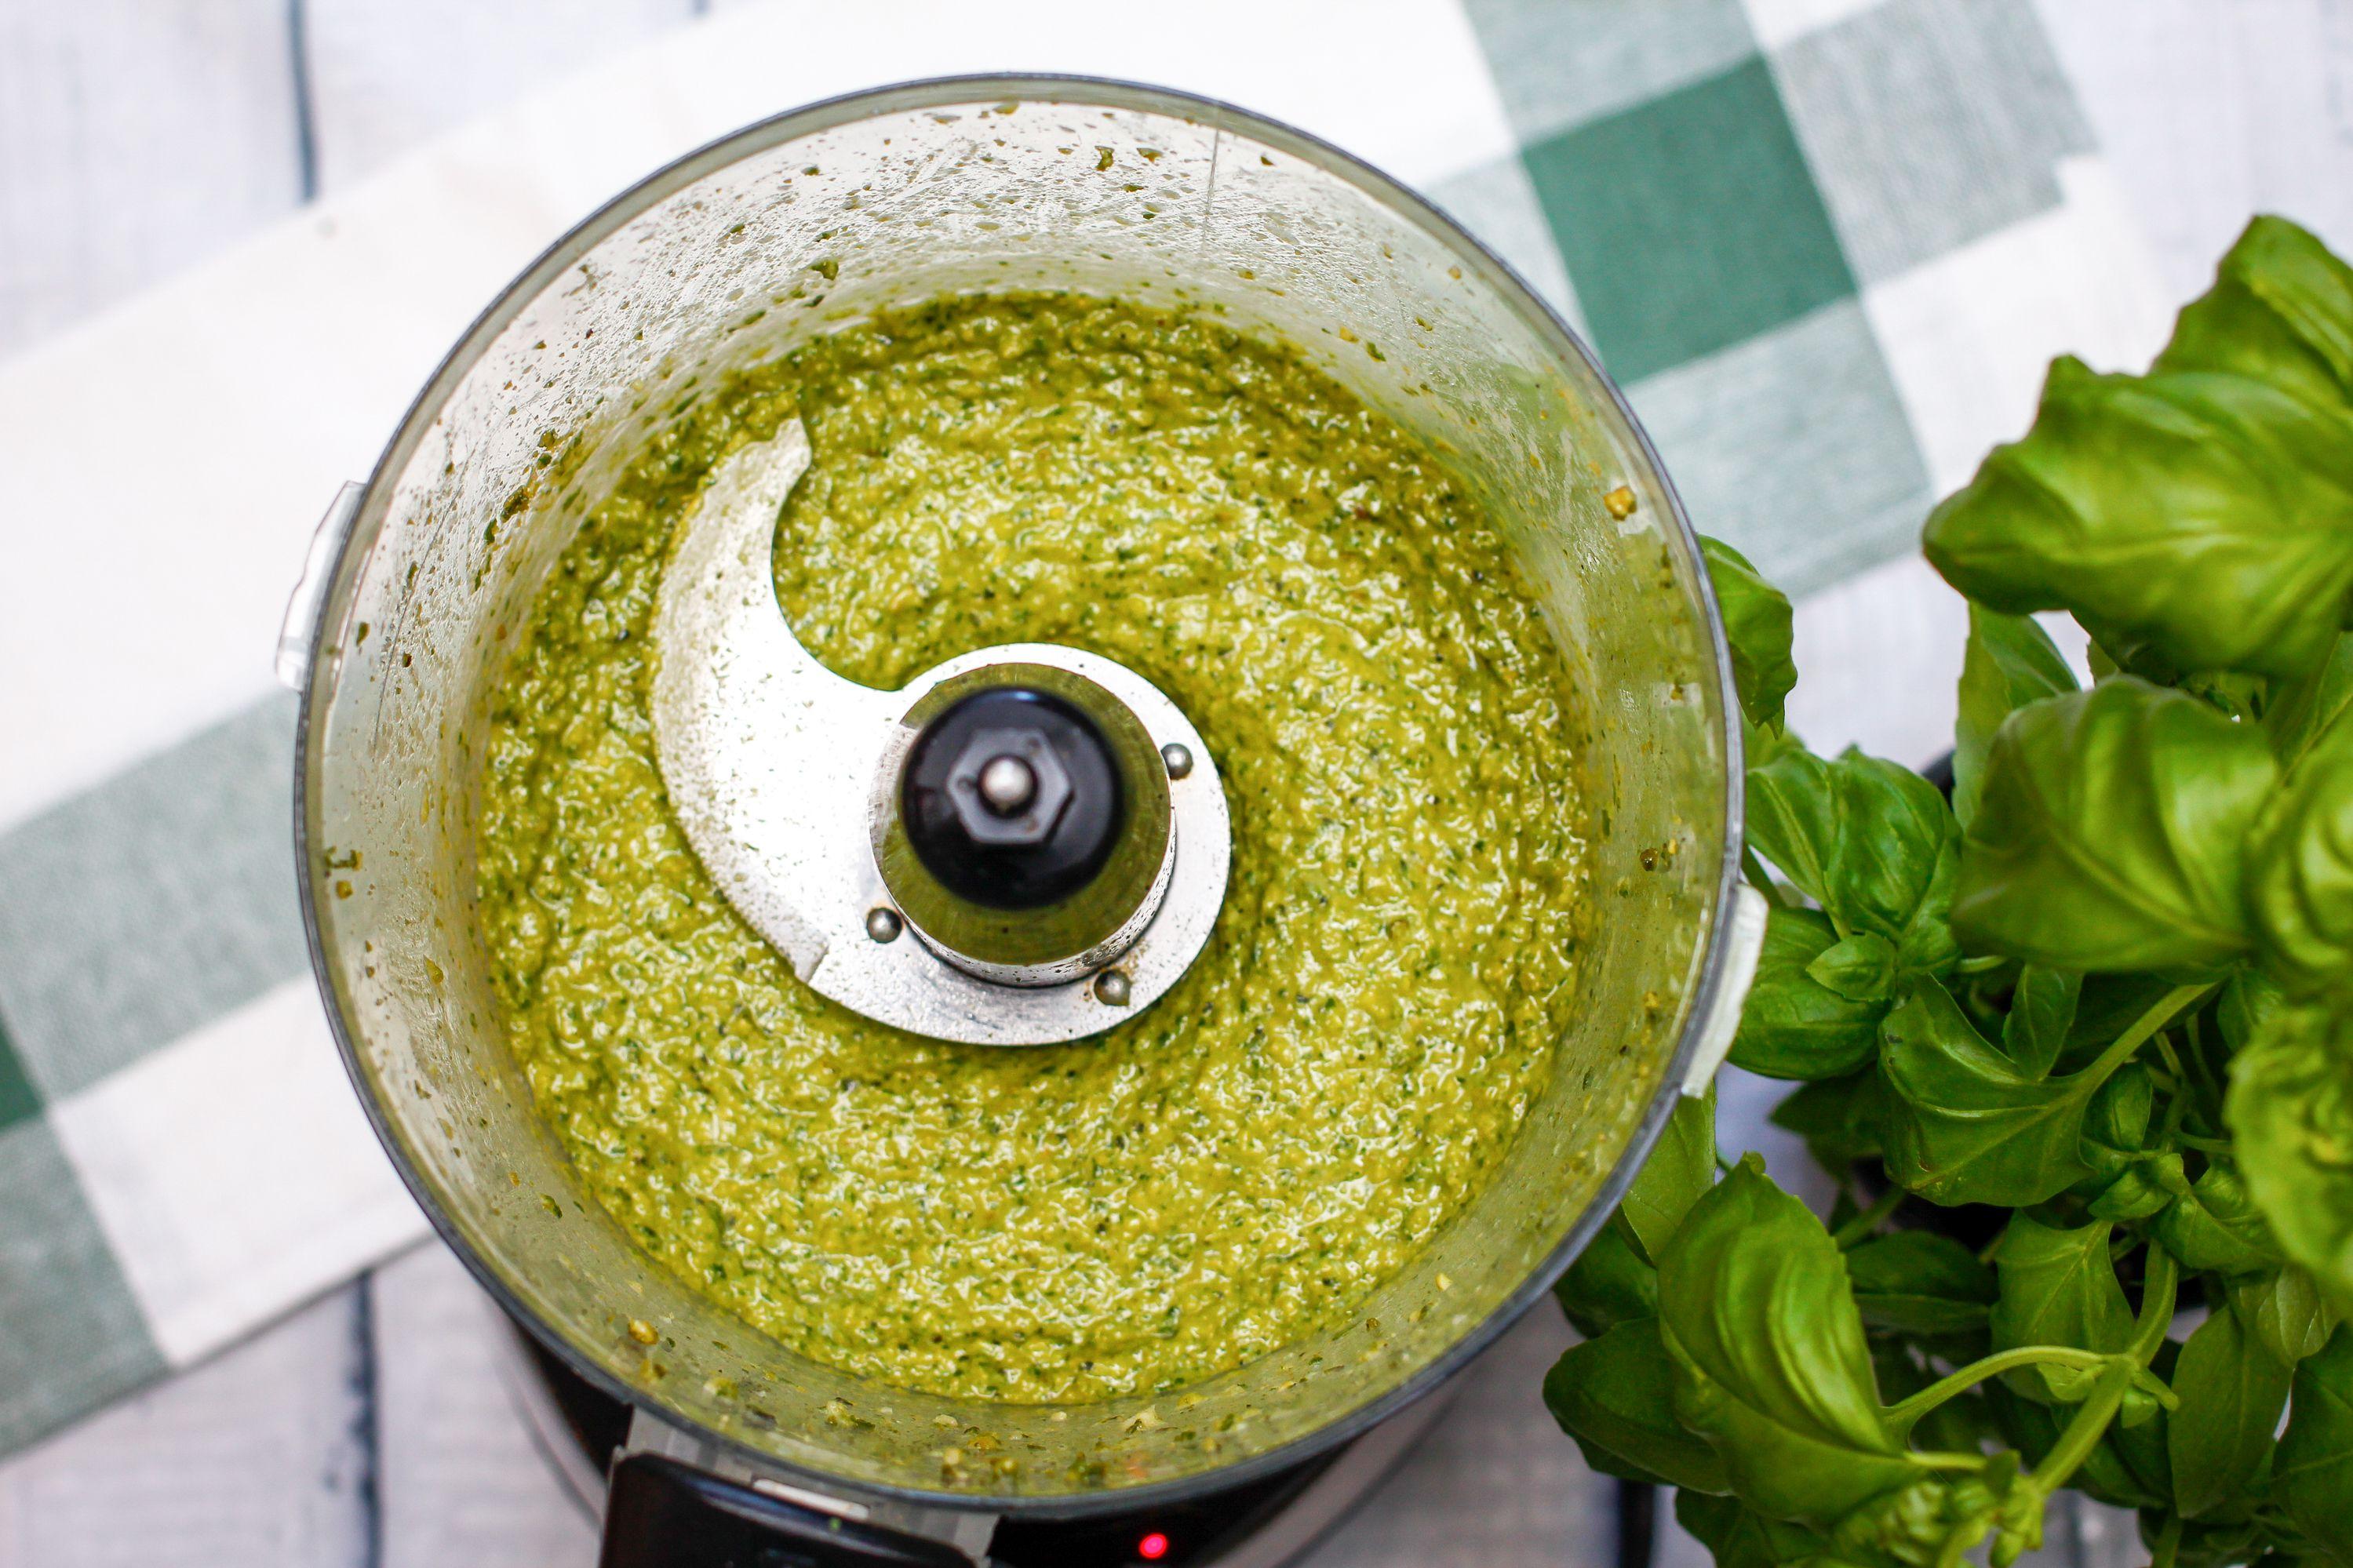 Vegan Pesto in a food processor